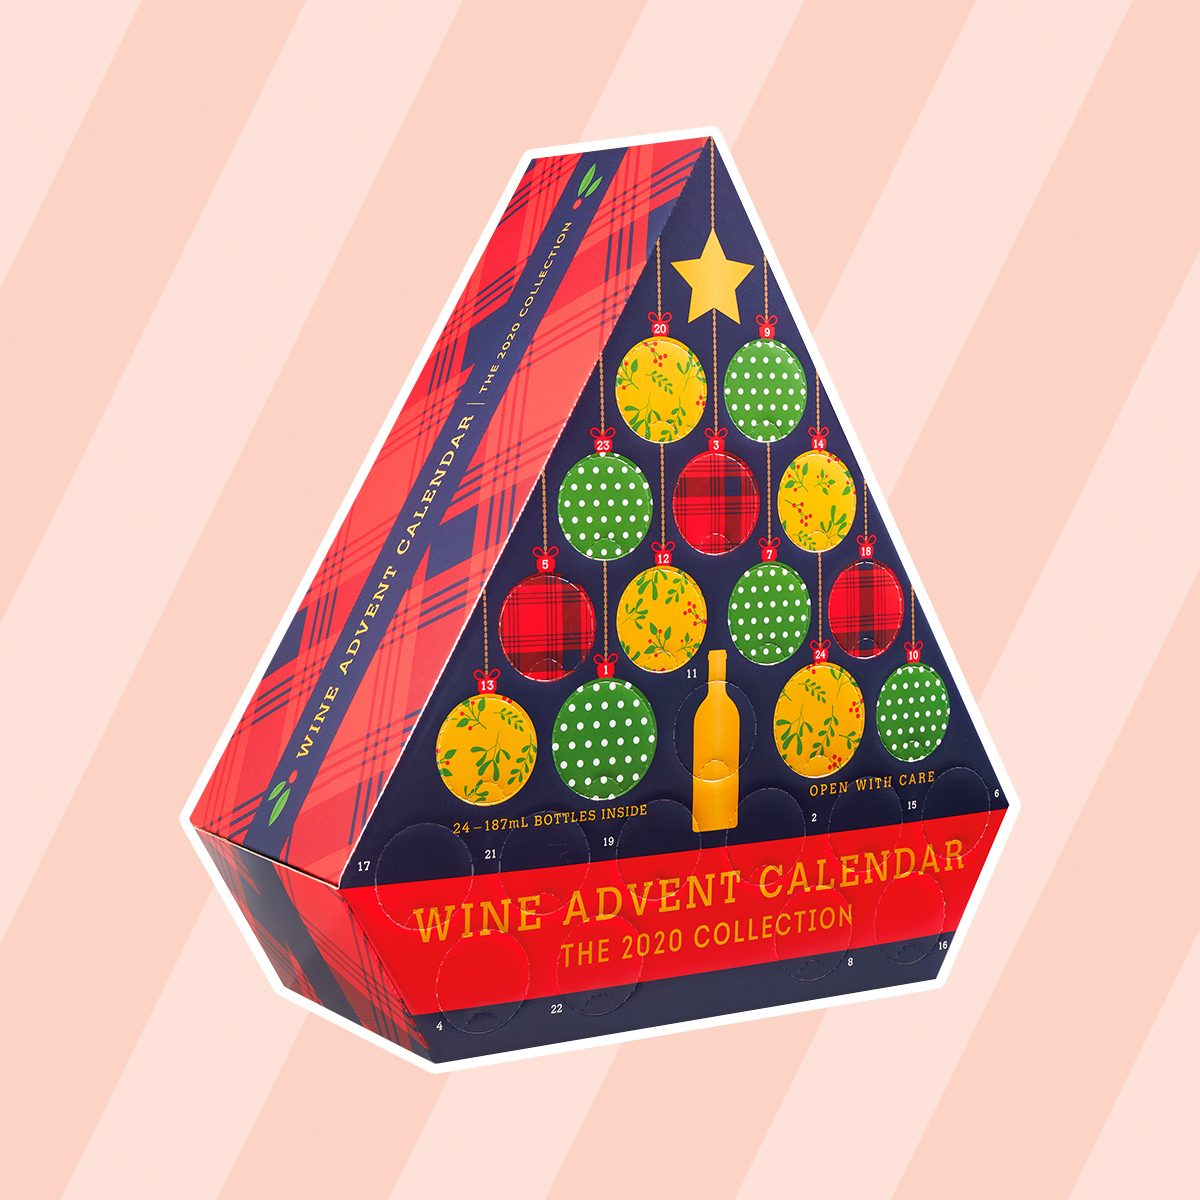 Wine advent calendar from Aldi